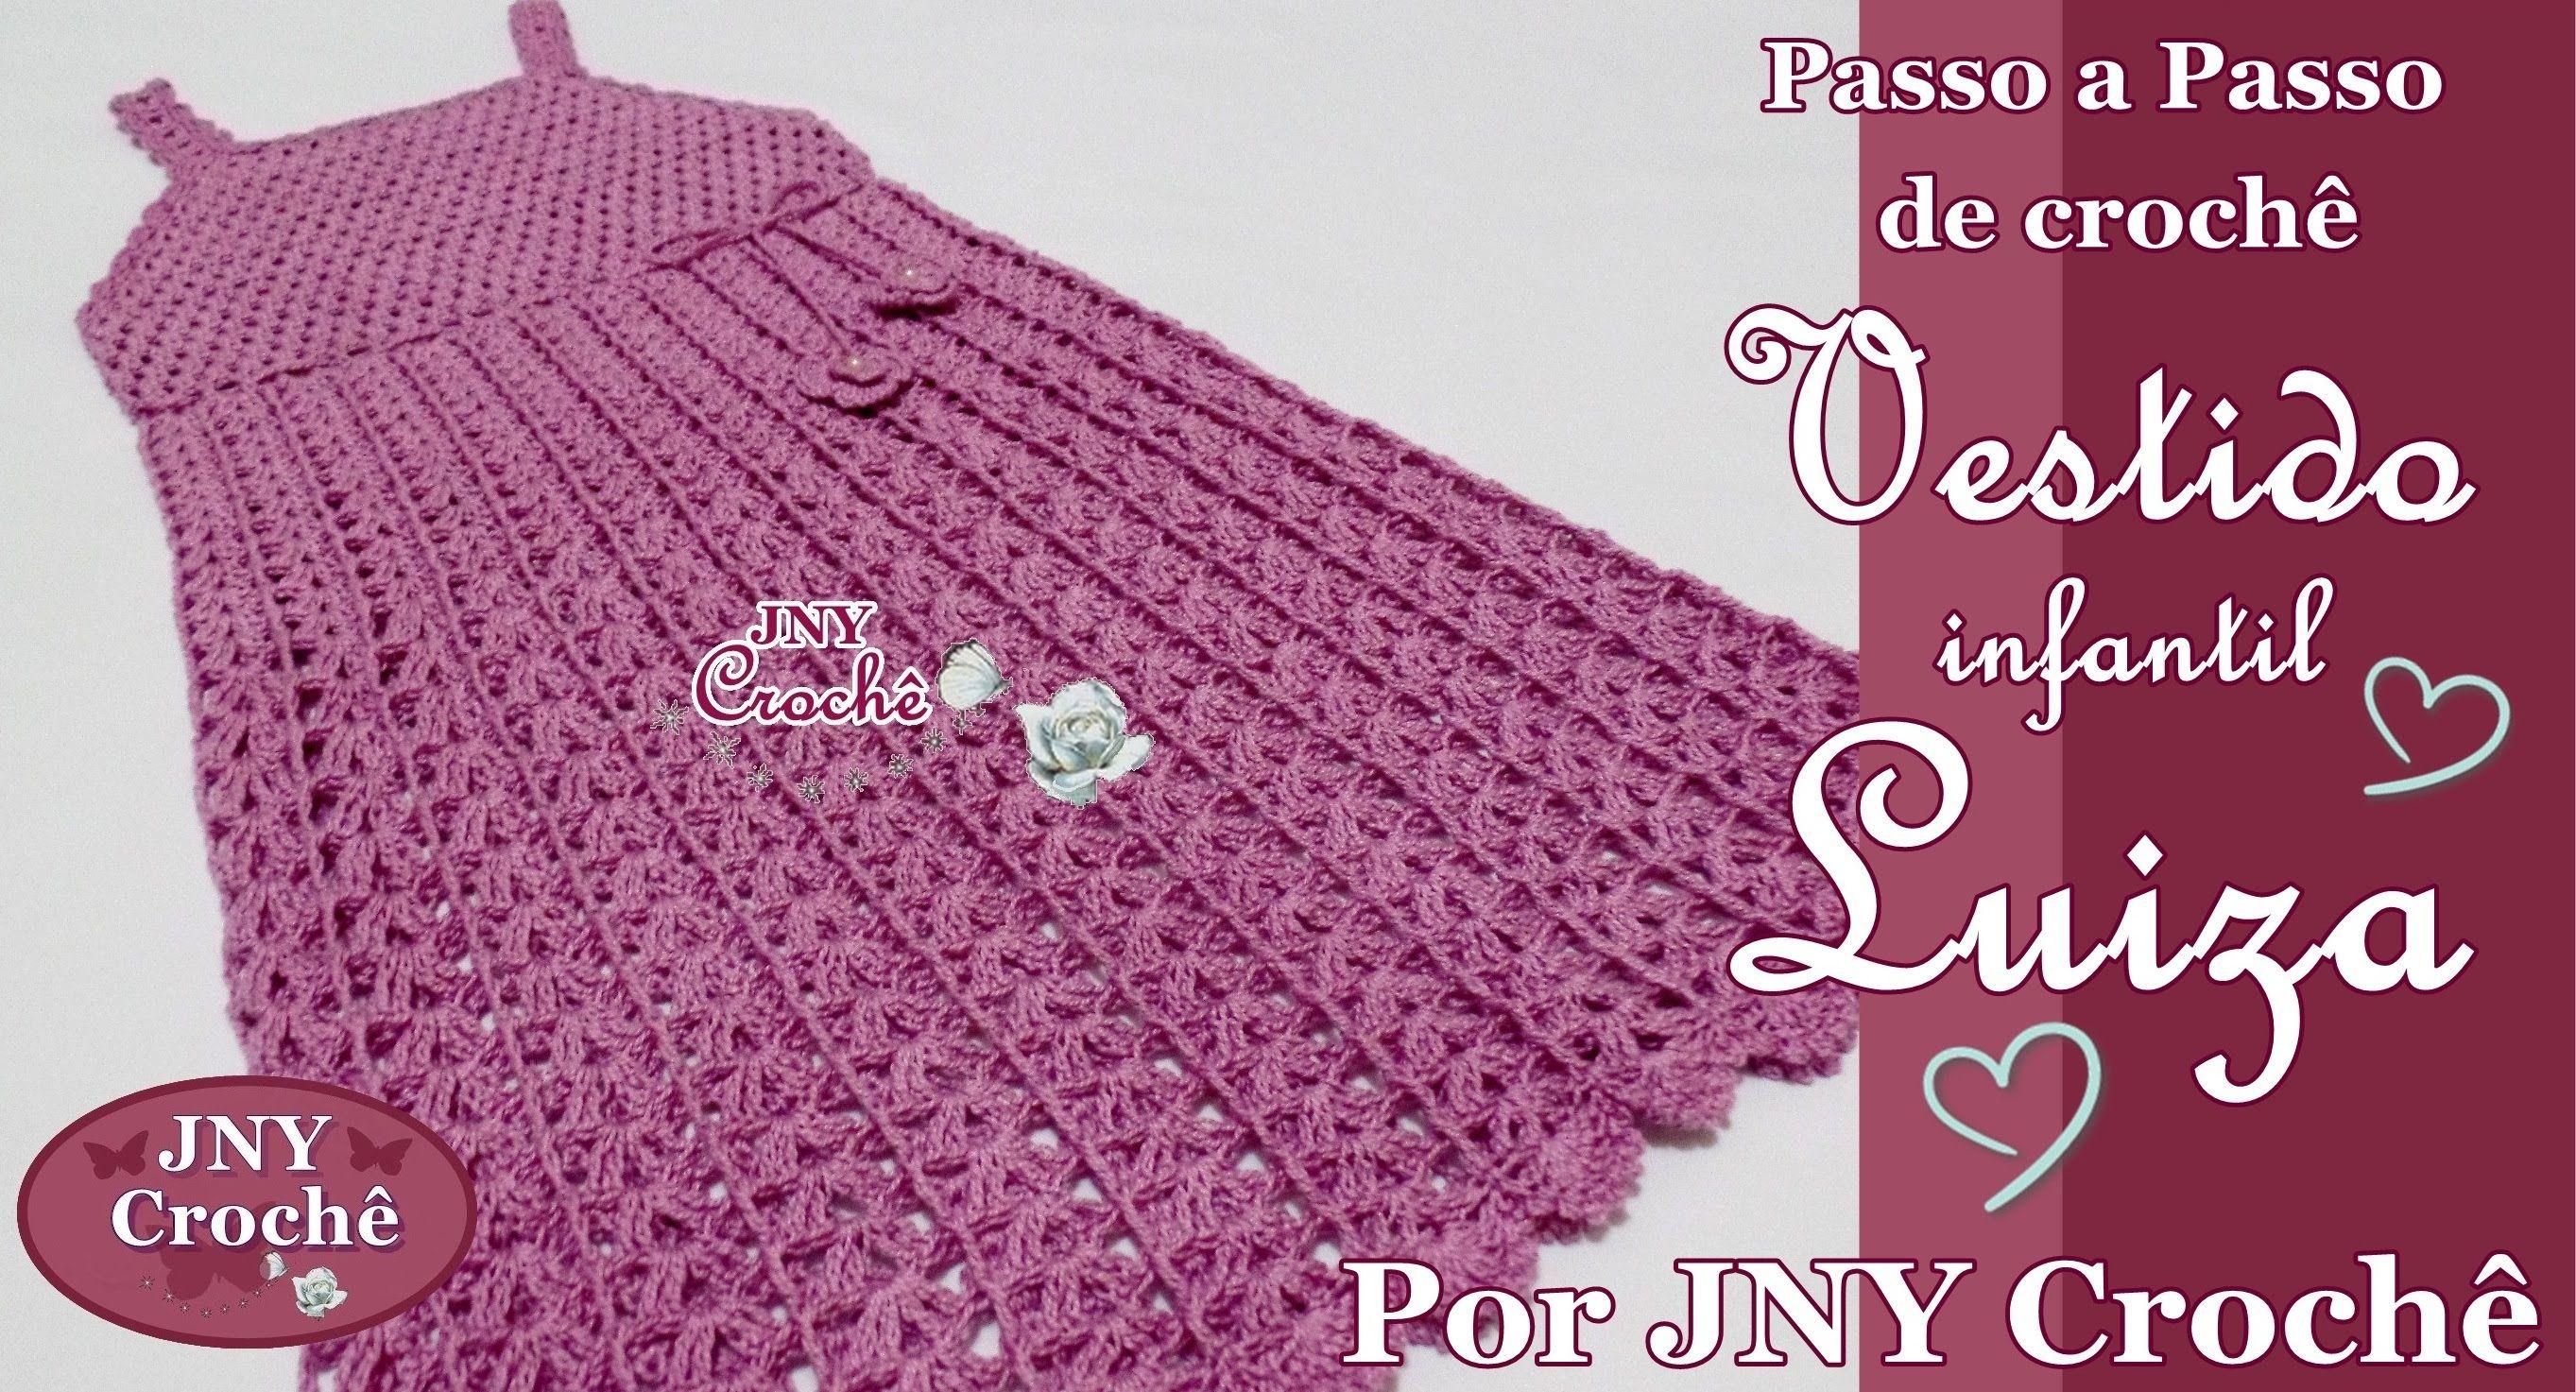 Pap De Crochê Vestido Infantil Luiza 6 A 8 Anos Por Jny